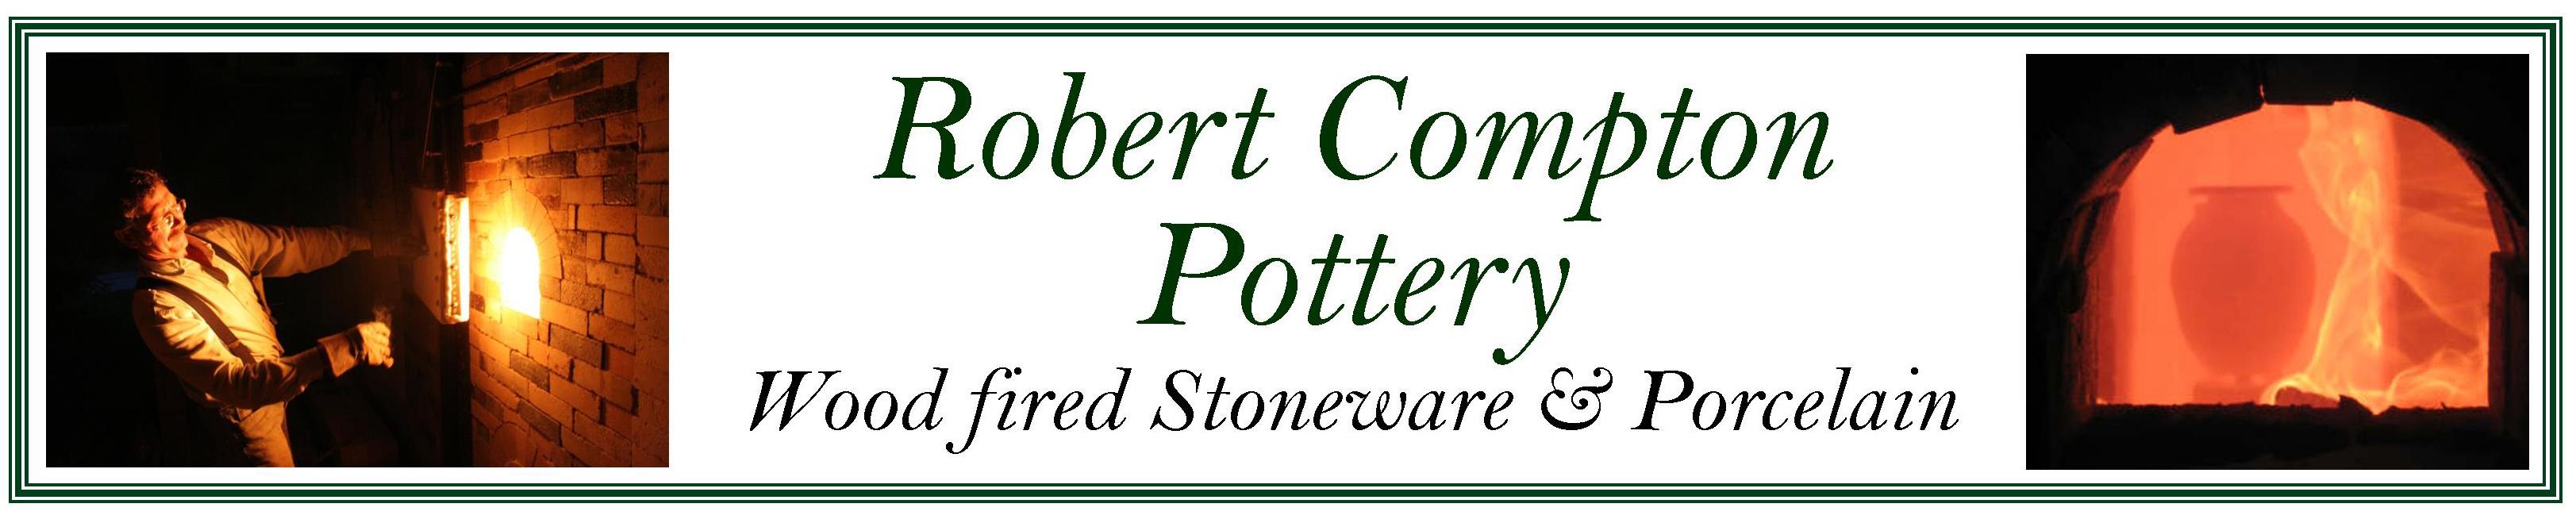 Robert Compton Pottery